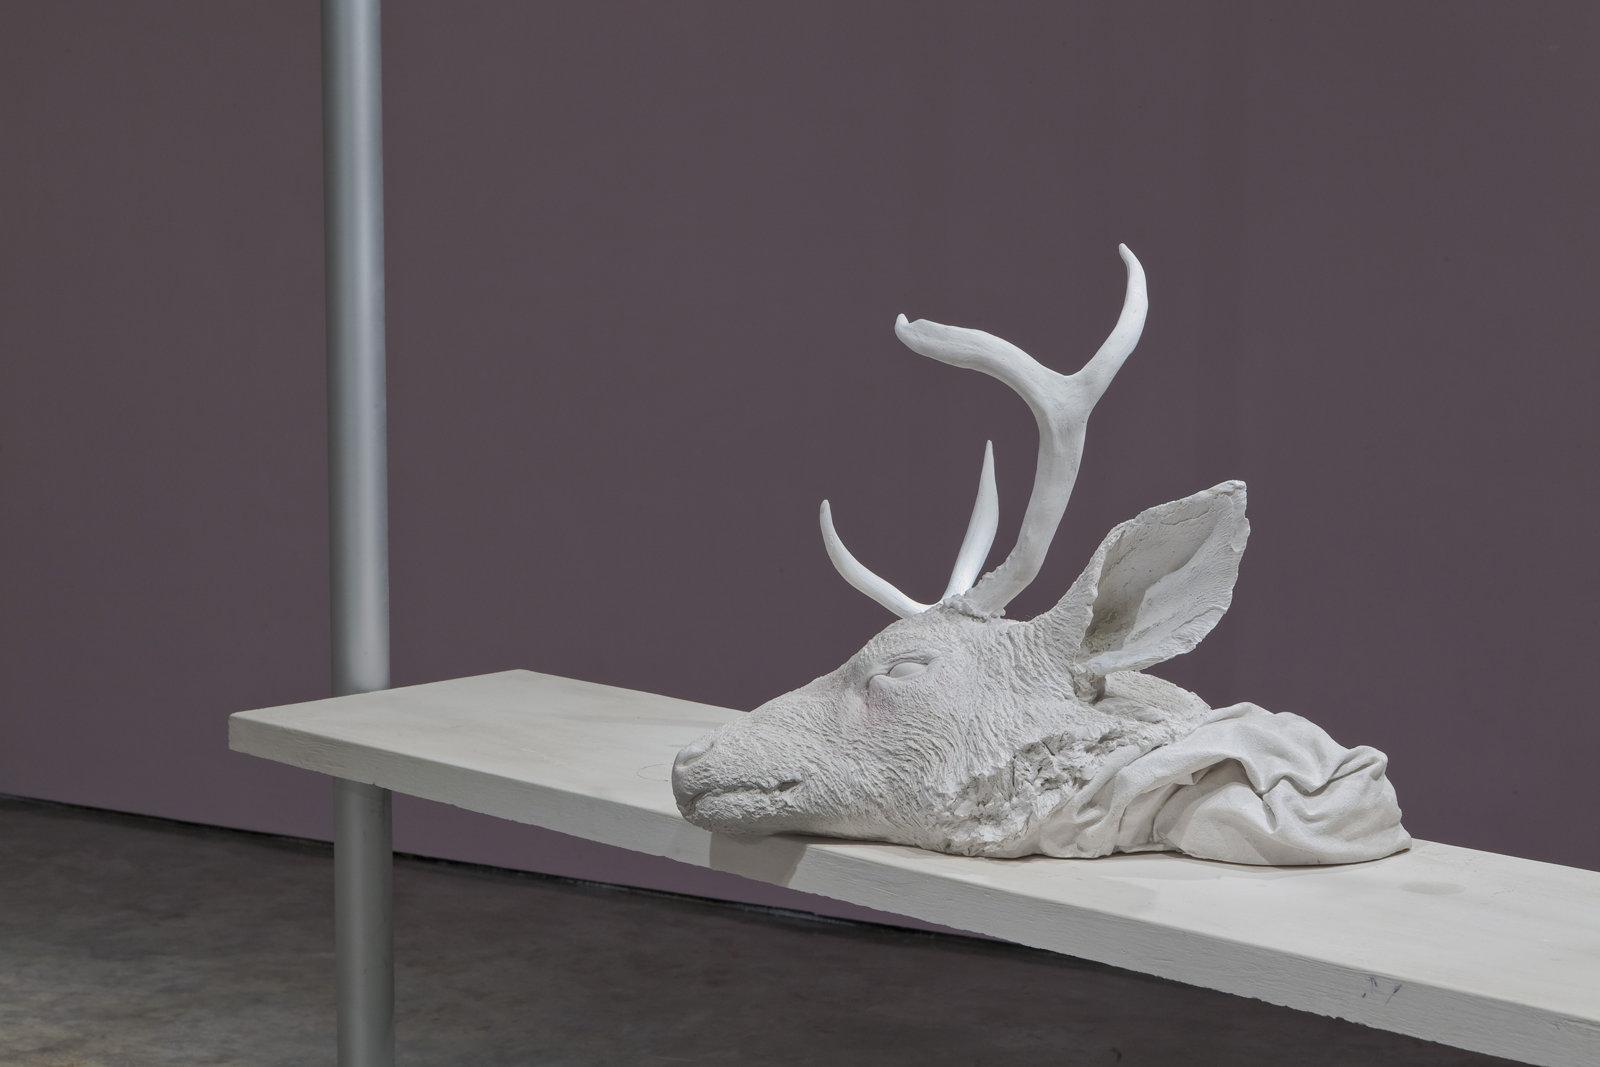 Liz Magor, Bedside, 2007, polymerized gypsum, hardware, lighting fixture, 109 x 17 x 73 in. (305 x 244 x 46 cm) by Liz Magor